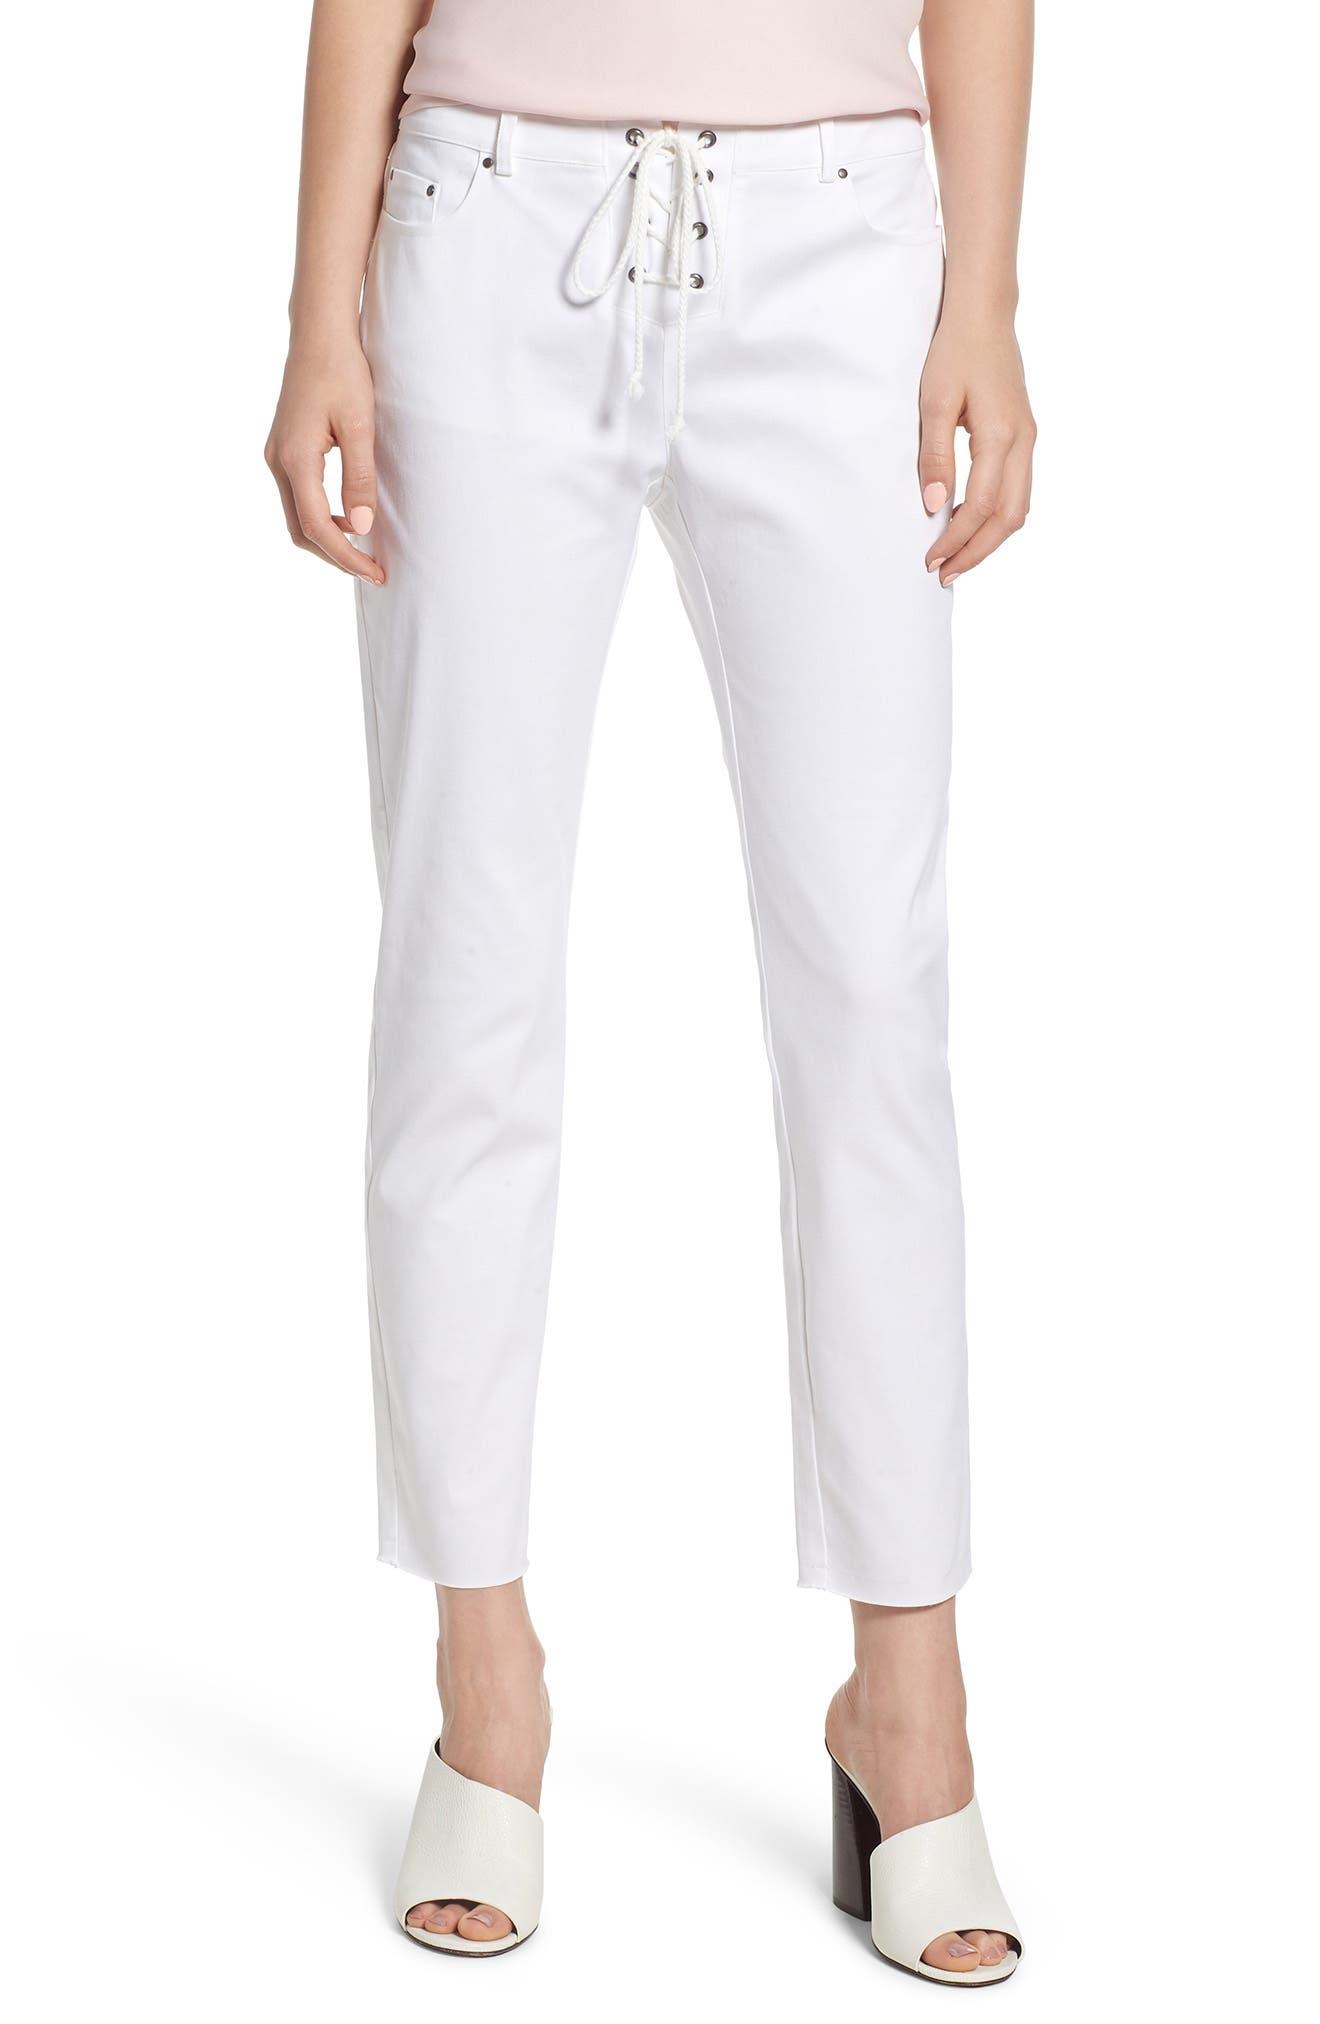 Jalanda Pants,                         Main,                         color, White